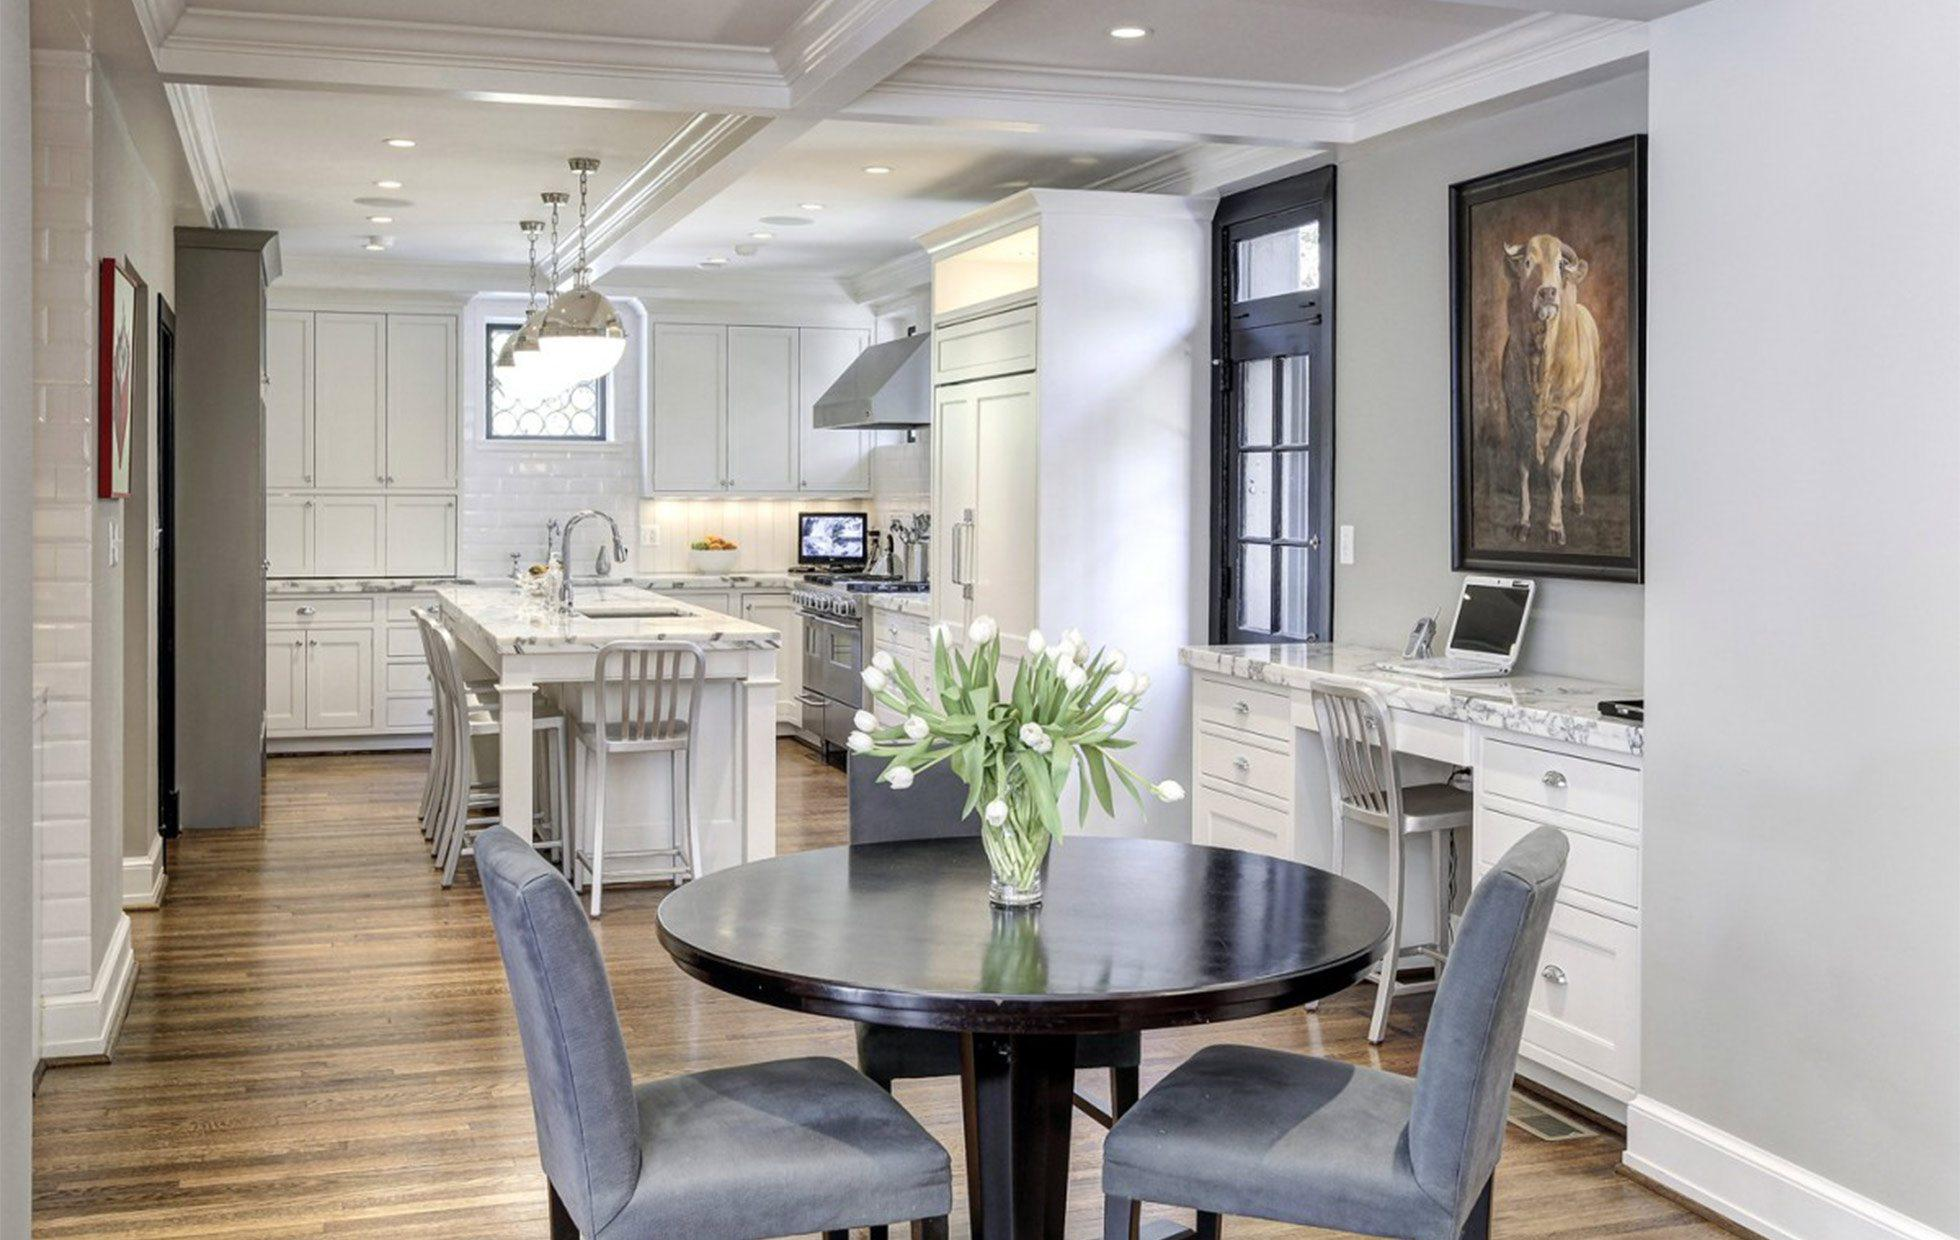 58820059cdb0e2446-Belmont-Road-NW-Washington-DC-Obamas-New-Home-Kitchen-and-Breakfast-Area-1200x800